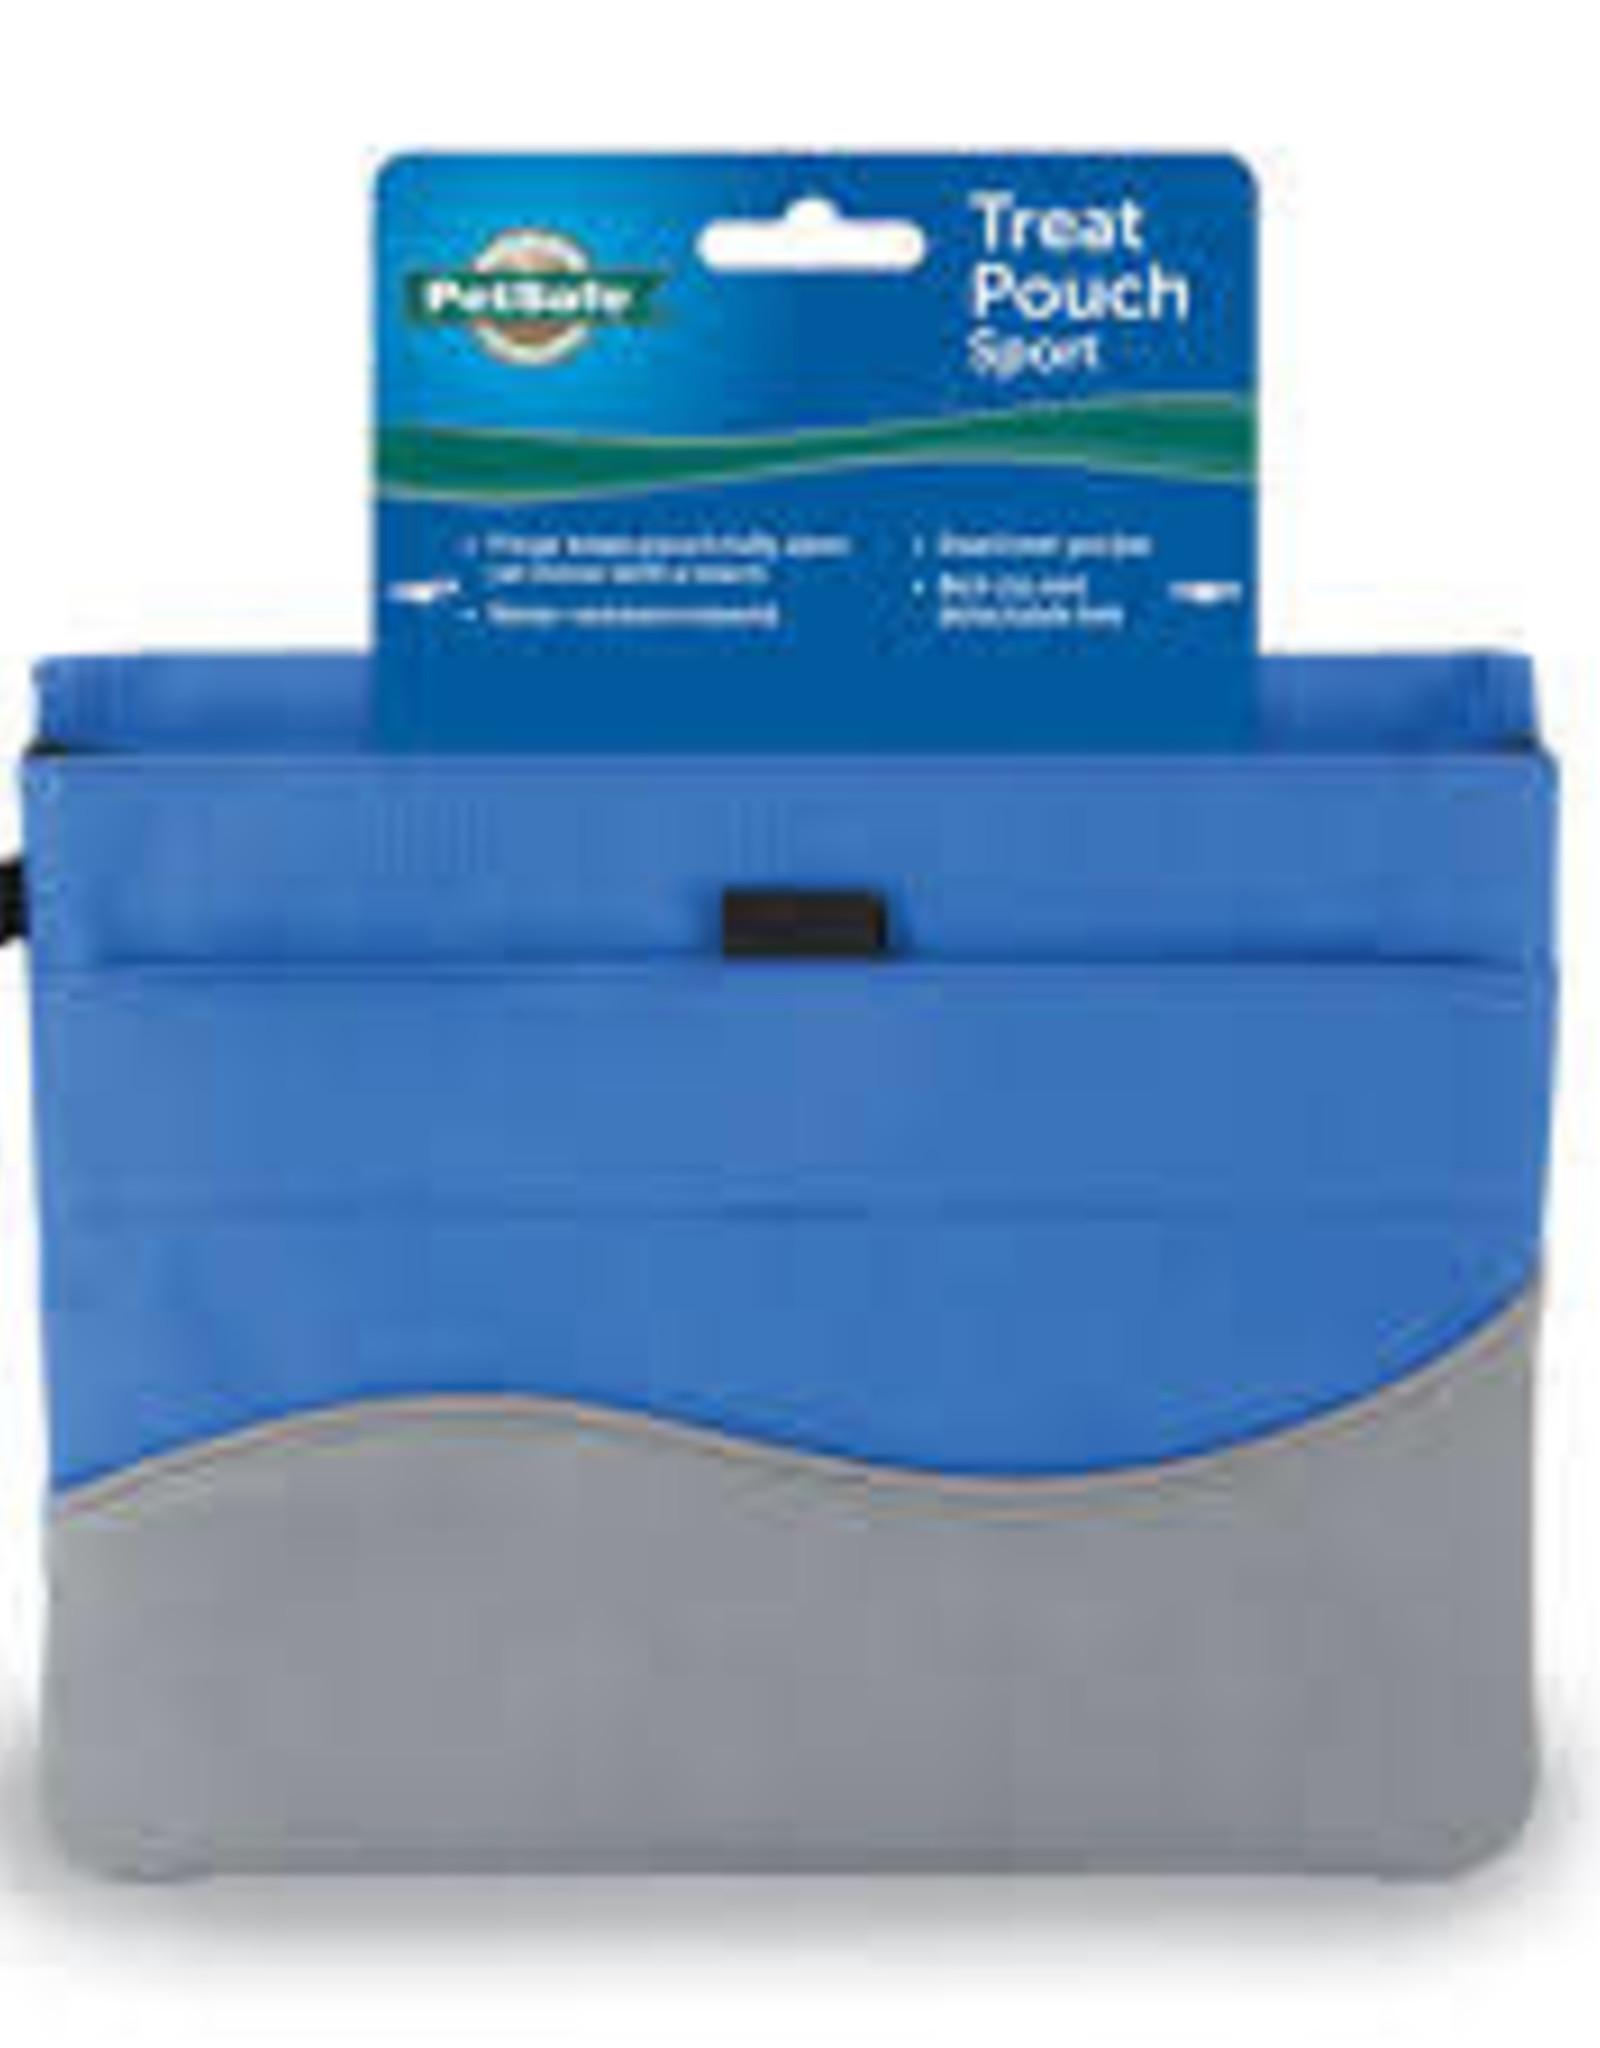 PetSafe Petsafe Treat Pouch - blue